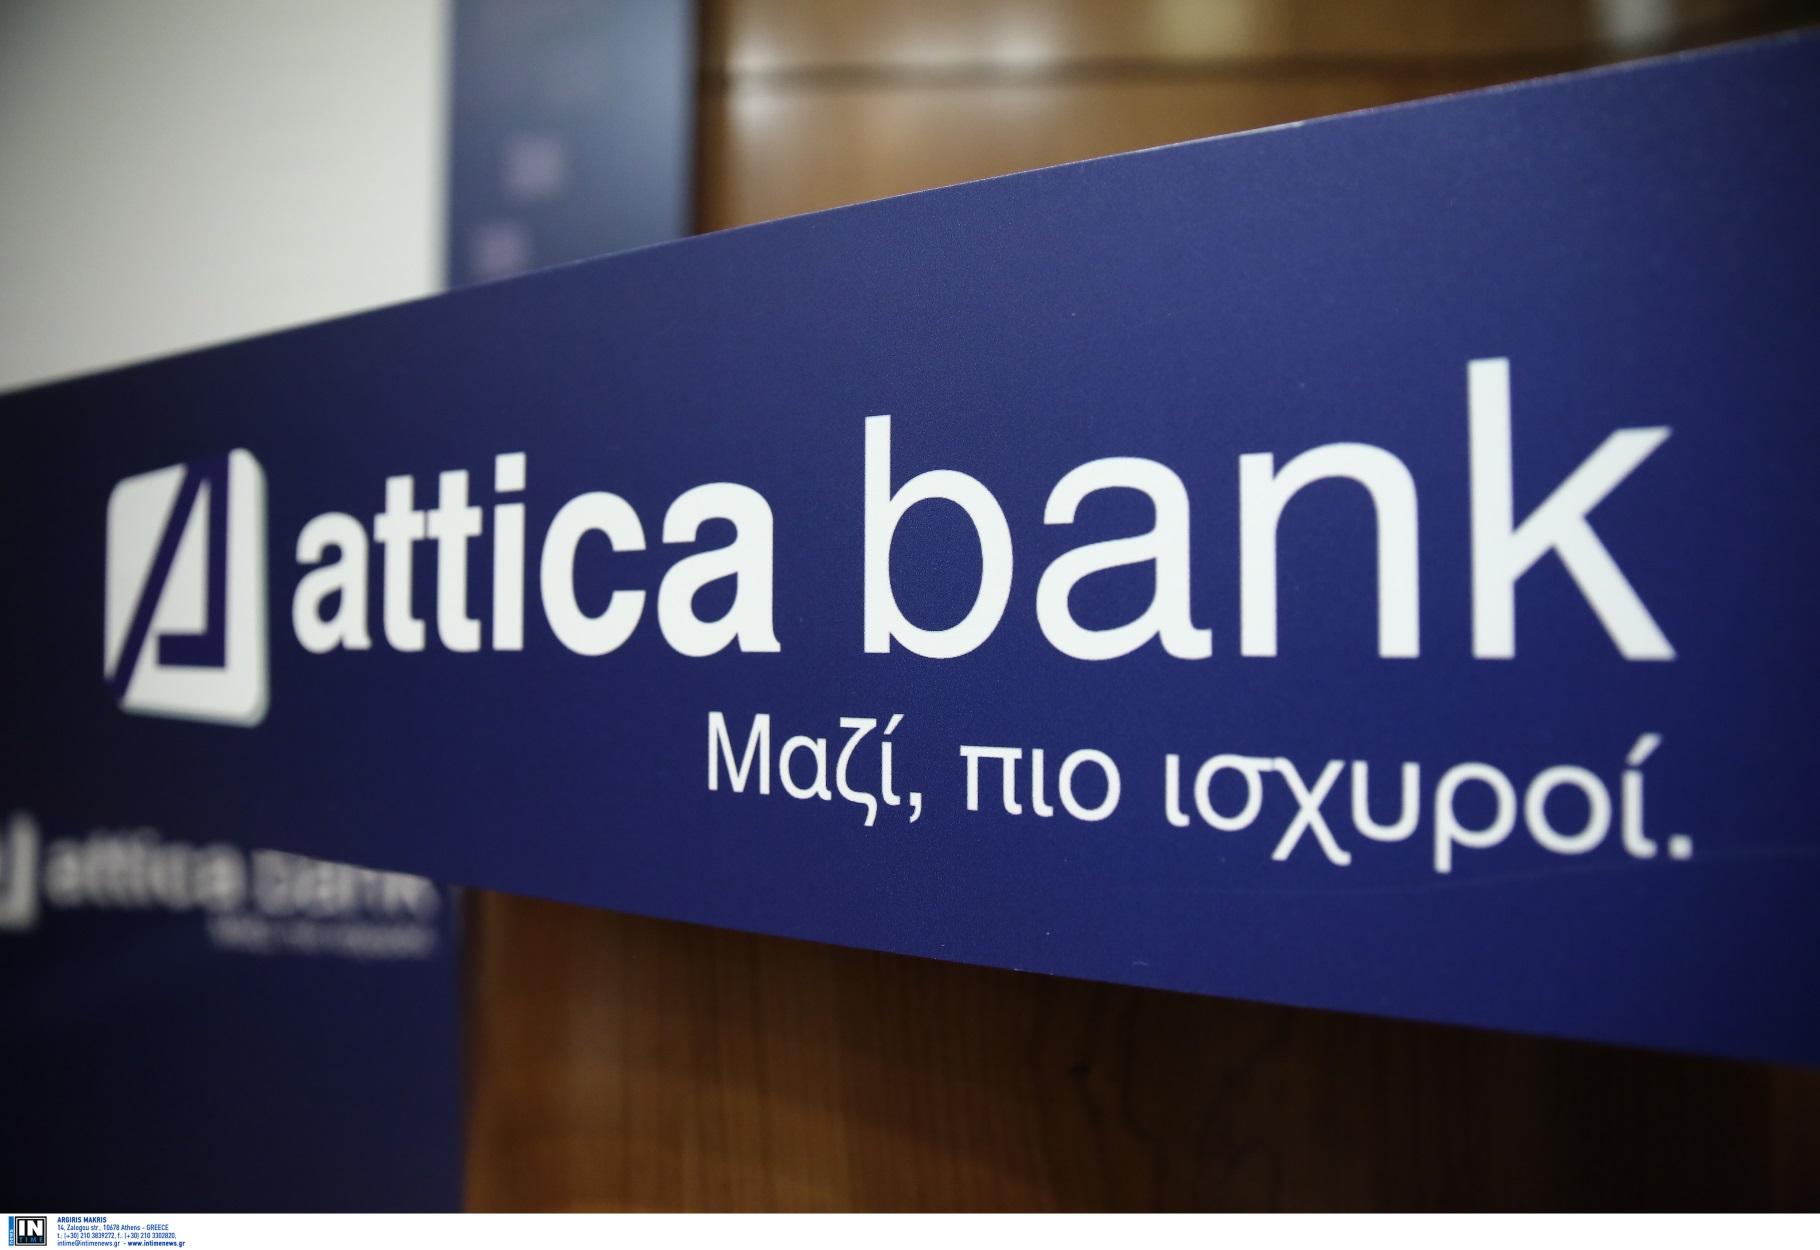 AtticaBank: Στηρίζει τις πολύ μικρές και νεοφυείς επιχειρήσεις